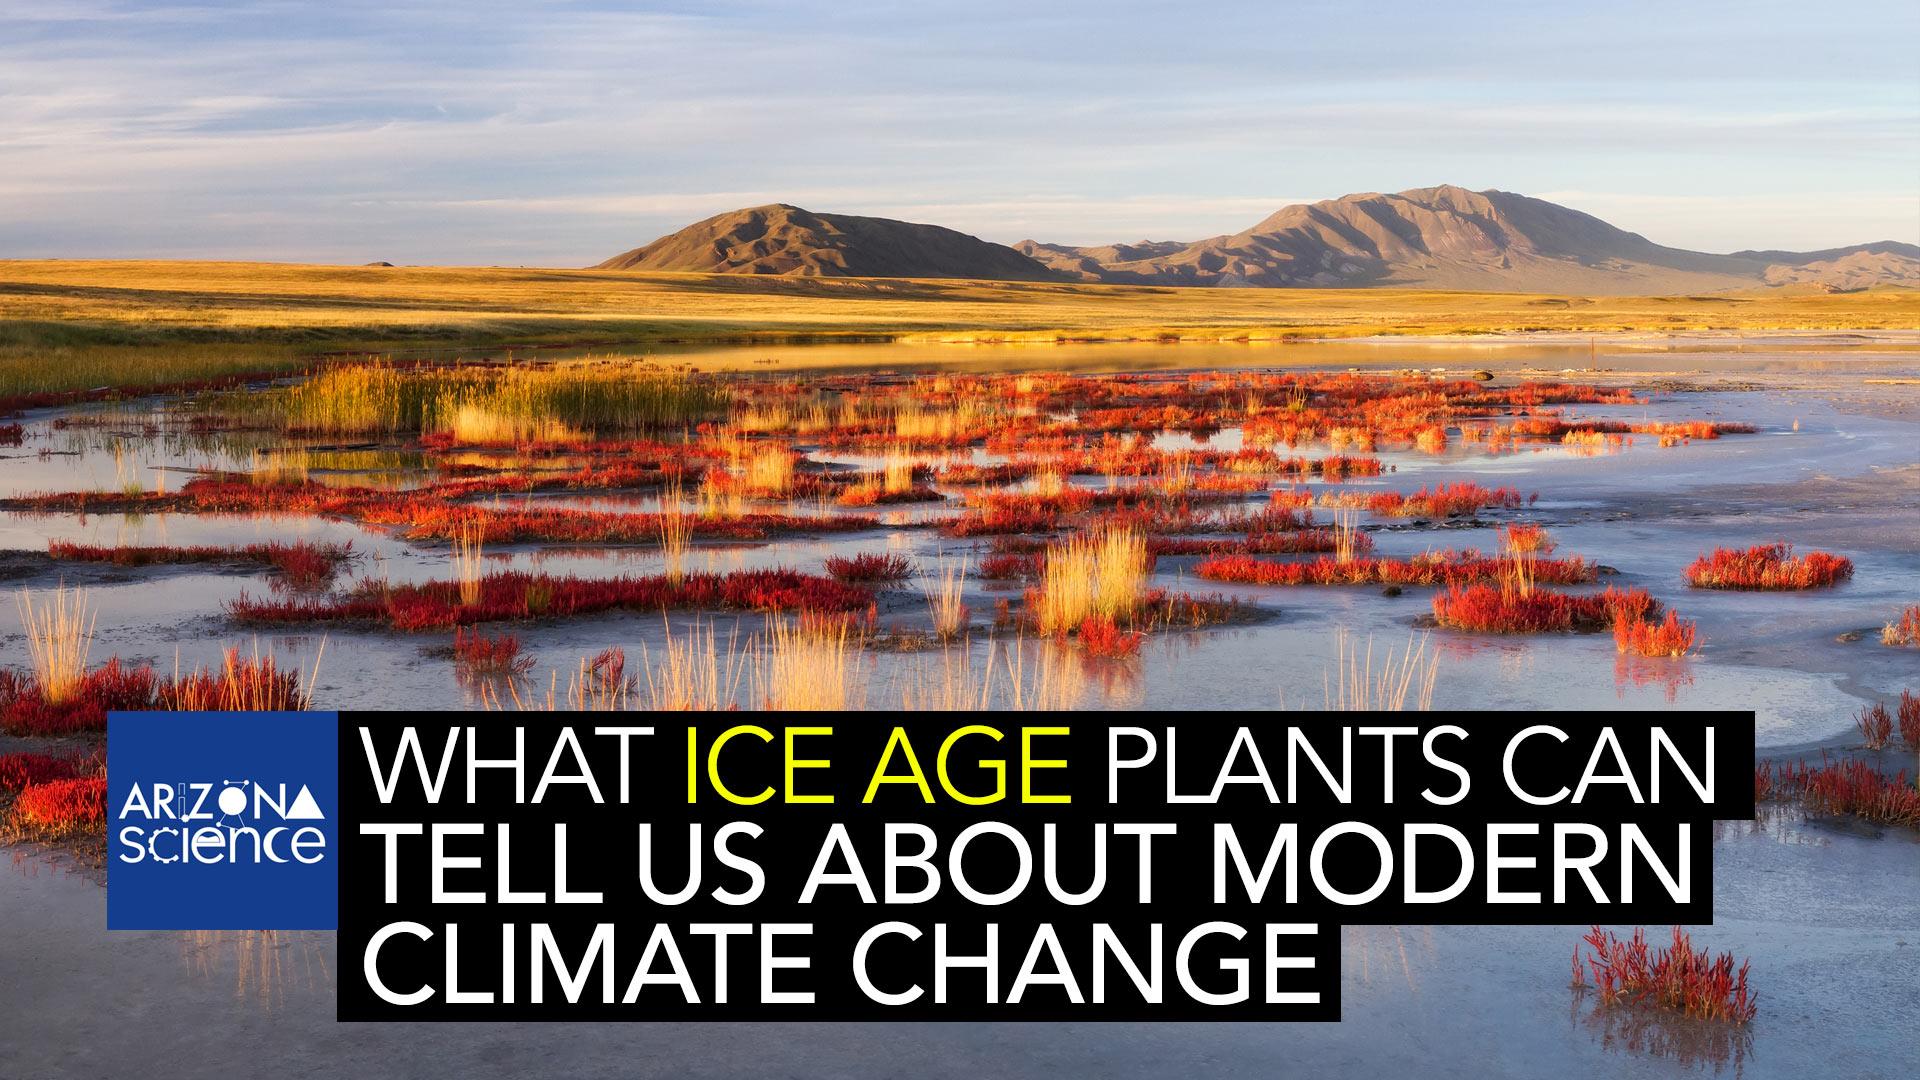 AZSCI Ice Age Plants